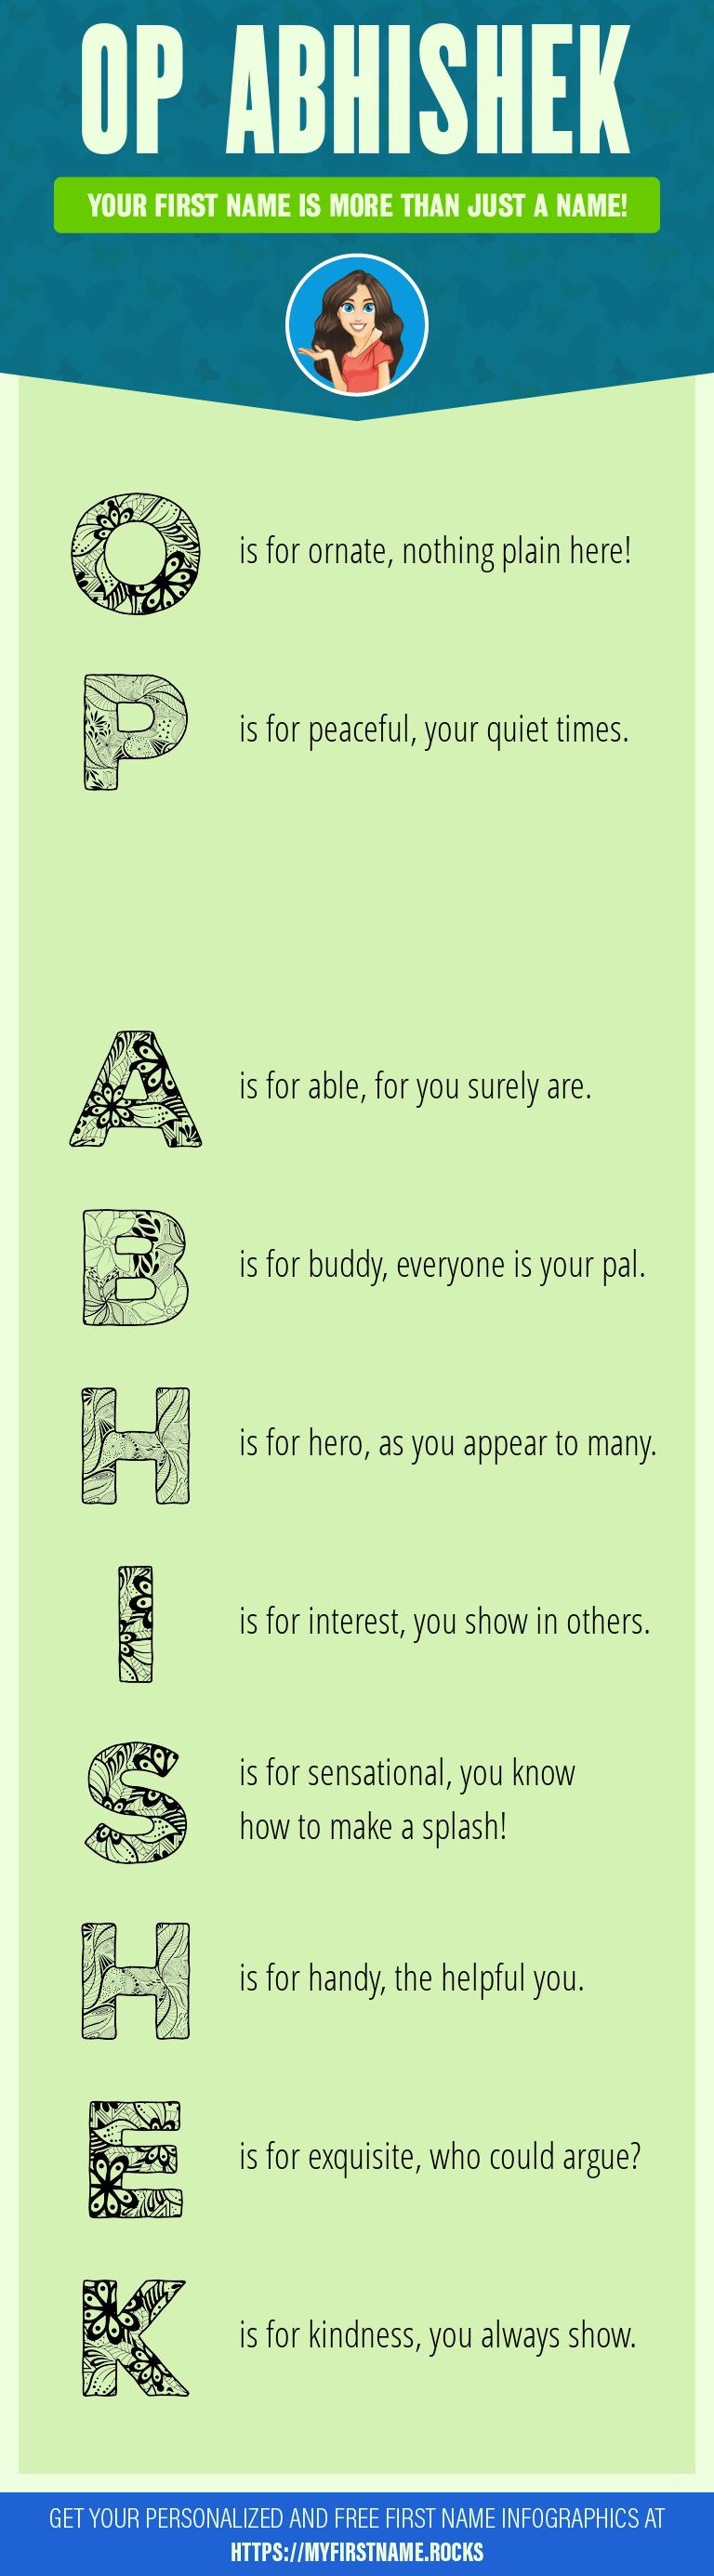 Op Abhishek Infographics